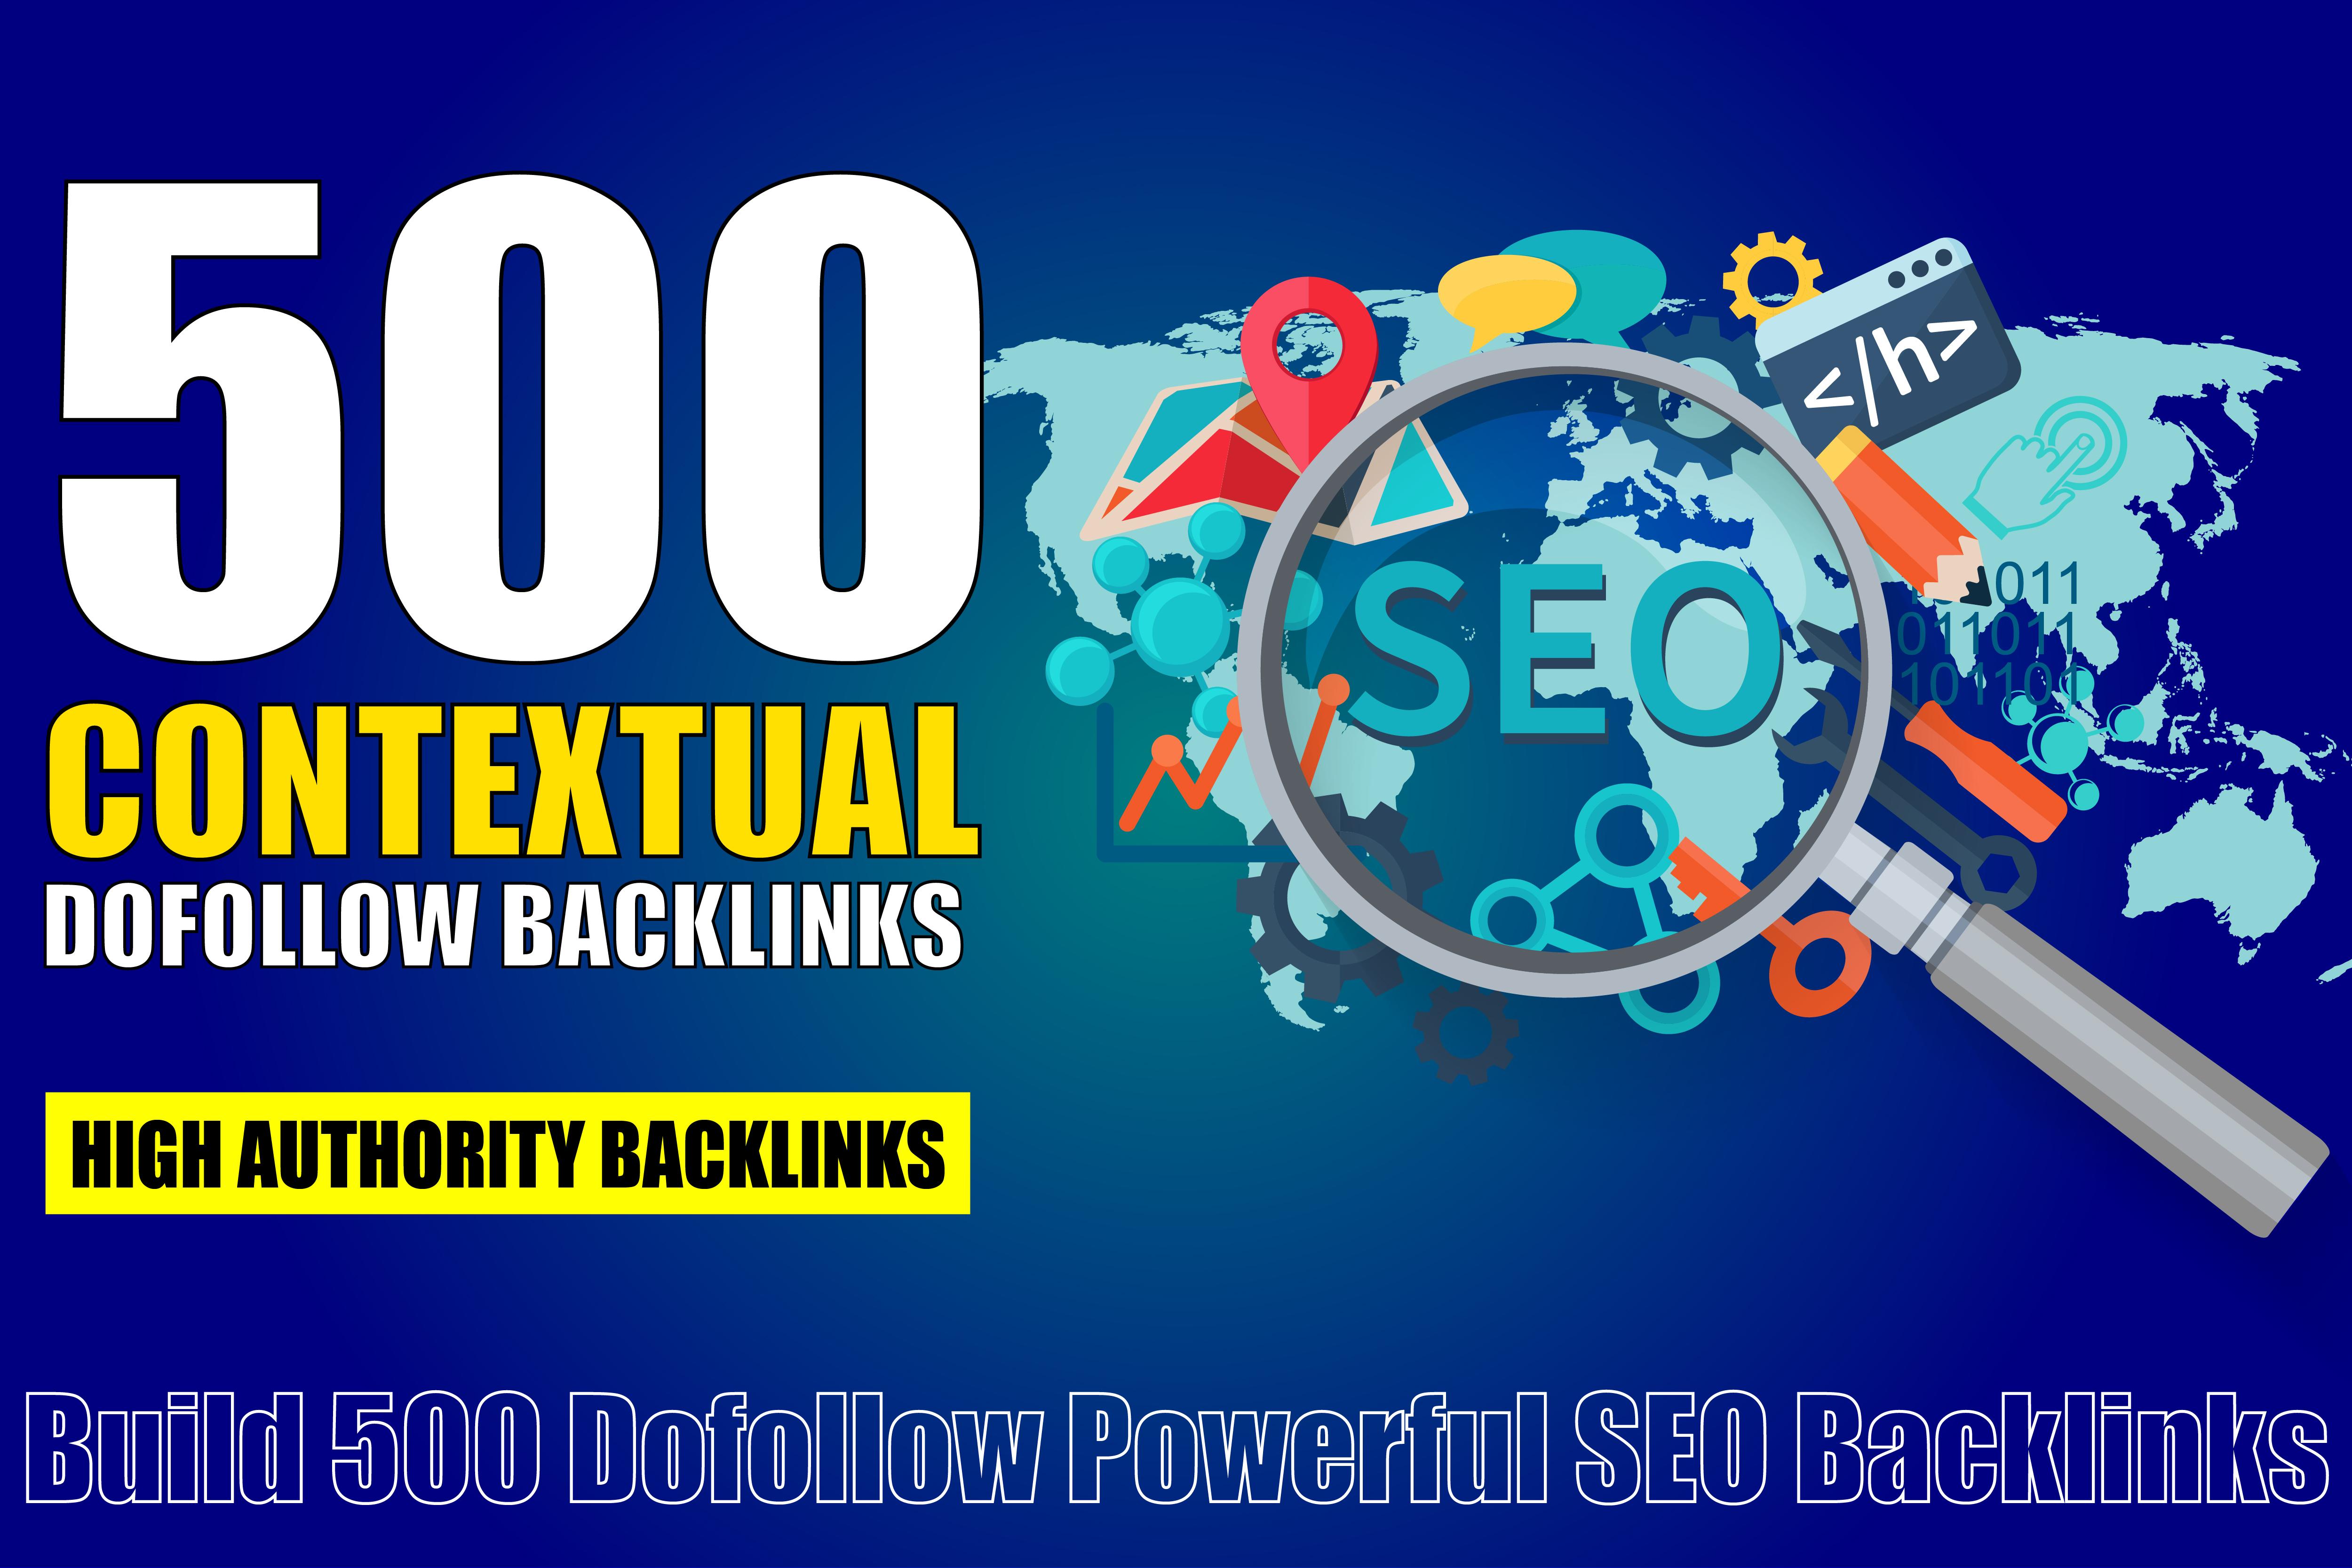 500 Dofollow Powerful SEO Backlinks